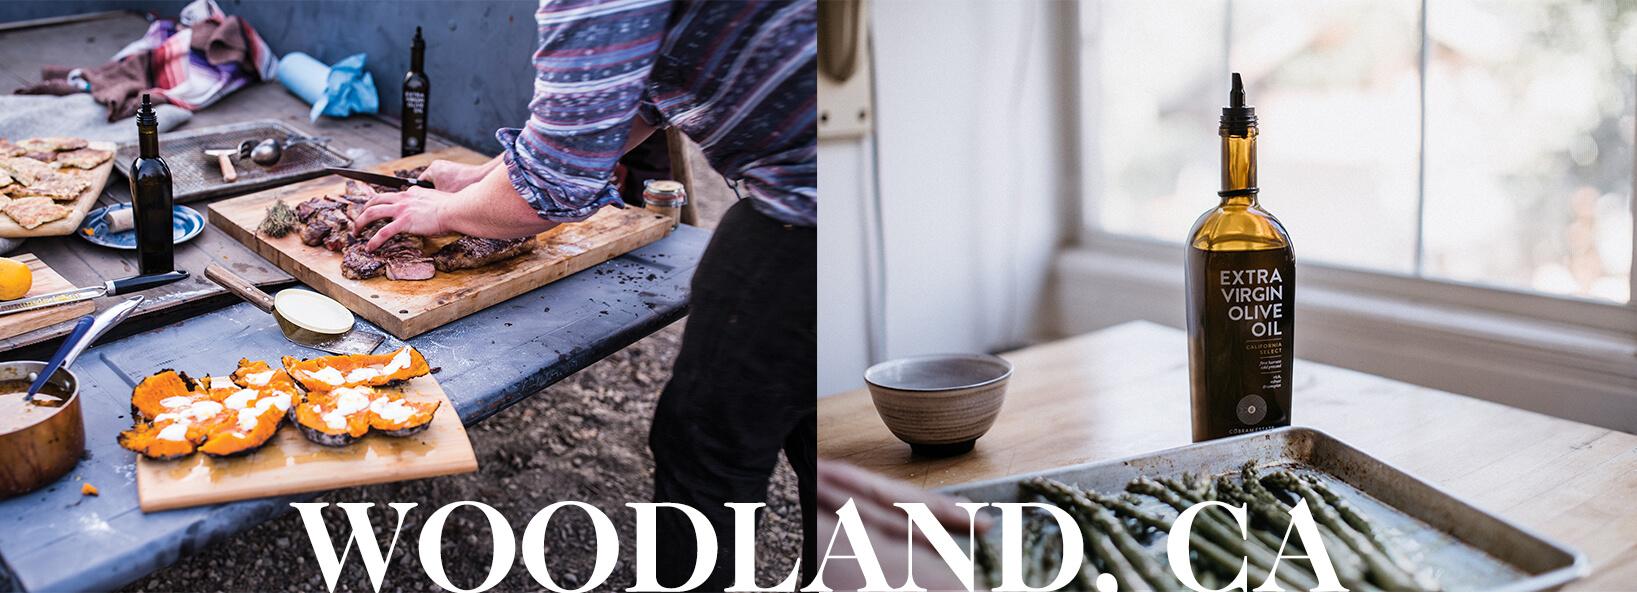 Woodland, California header